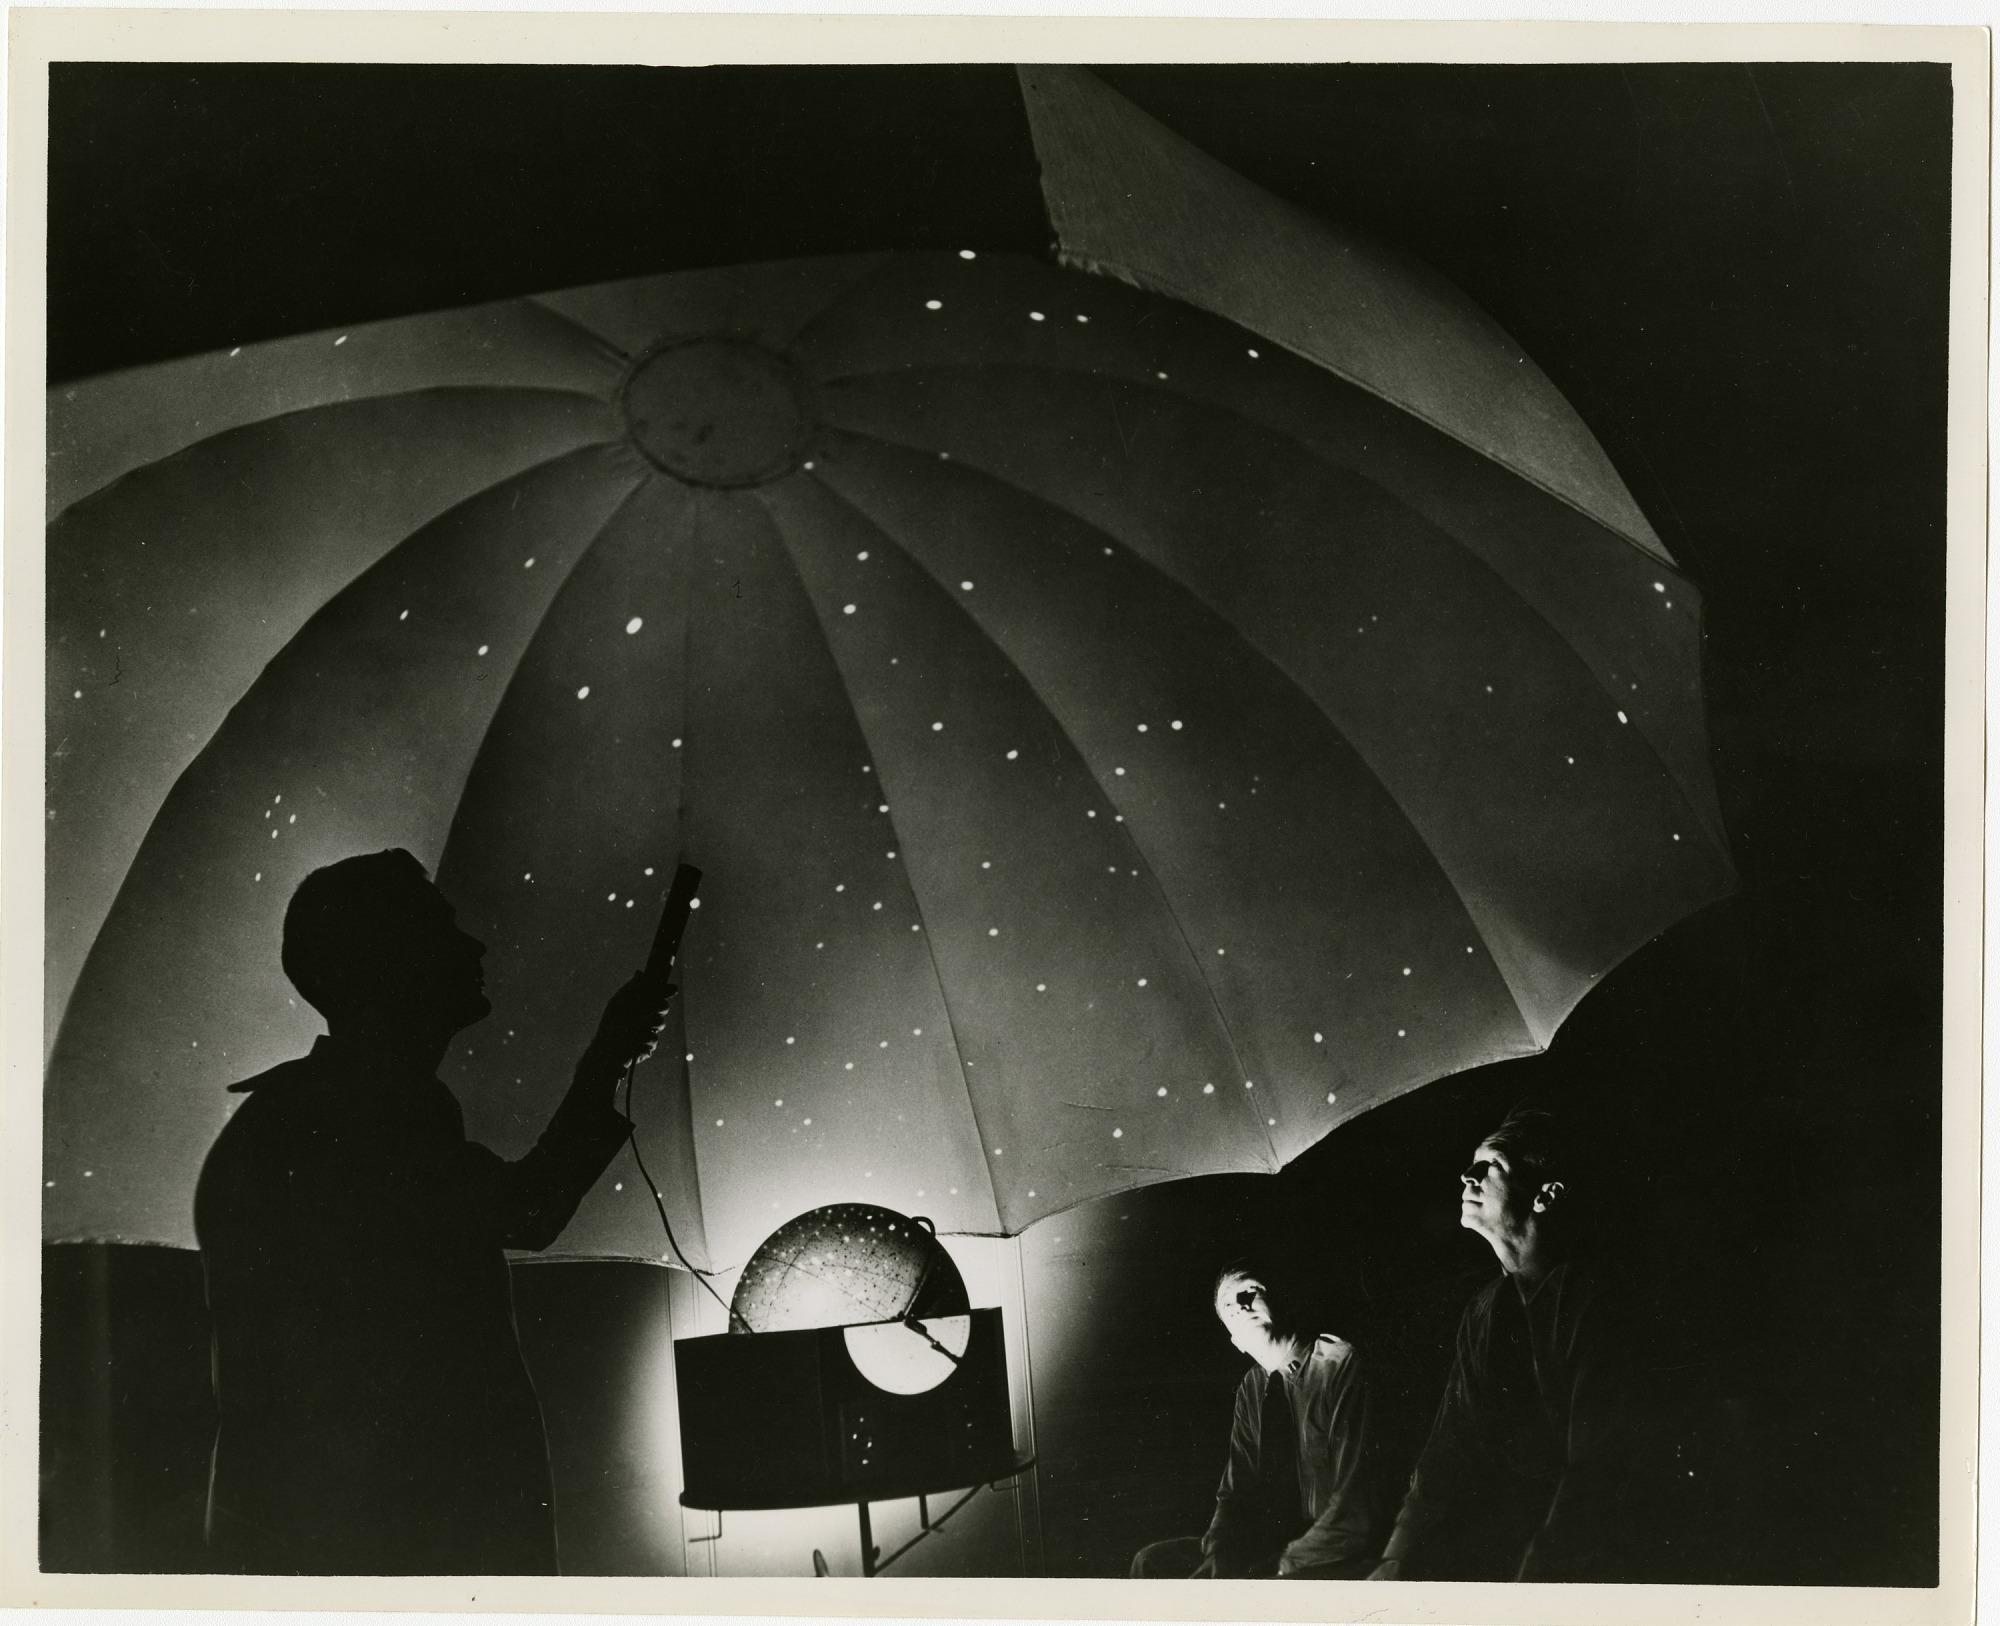 Science Service Astronomy and Astronautics Files